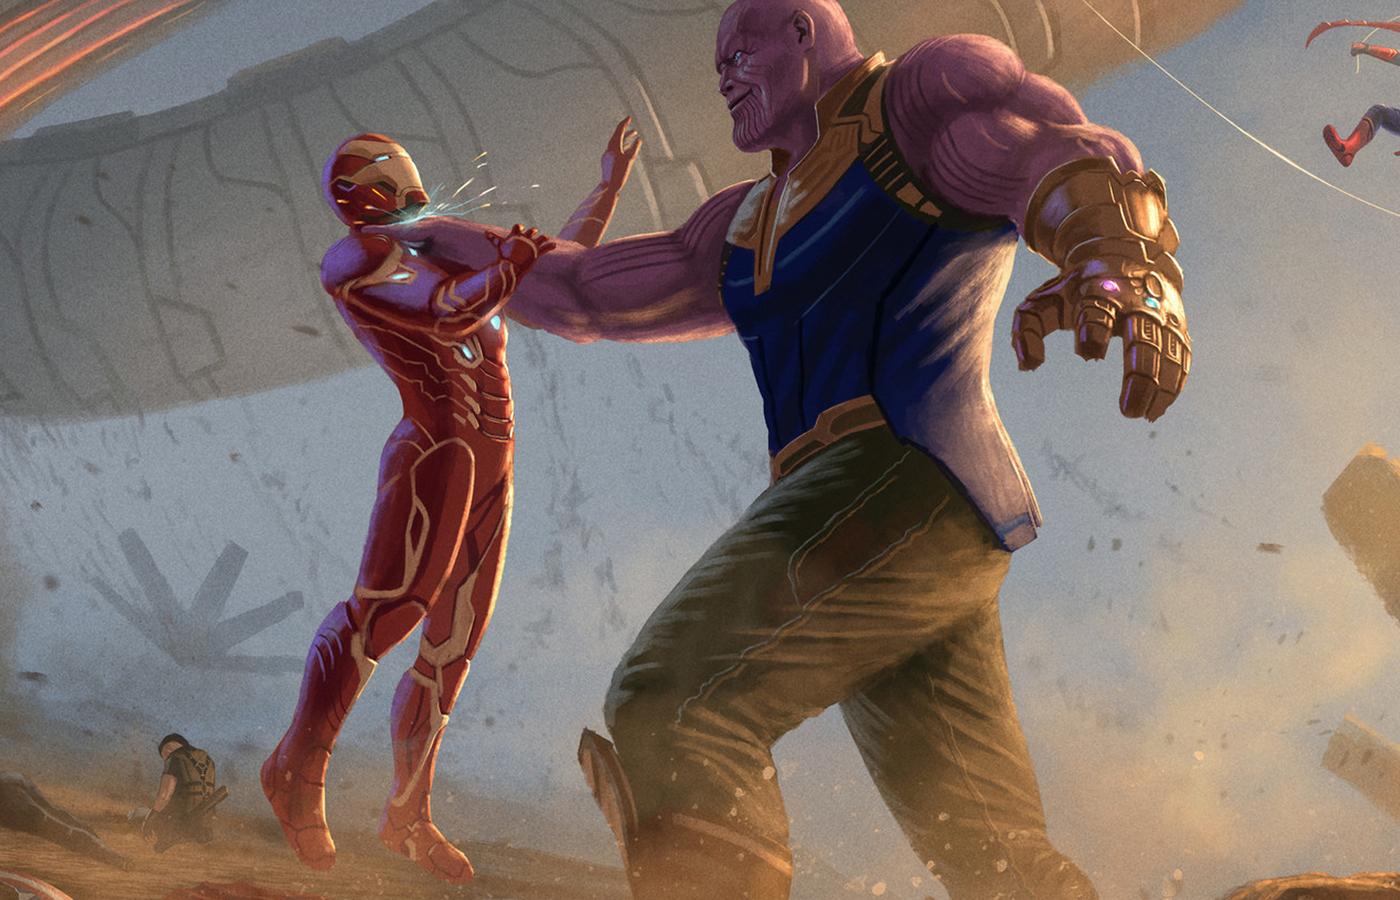 thanos-iron-man-avengers-infinity-war-2018-artwork-uv.jpg